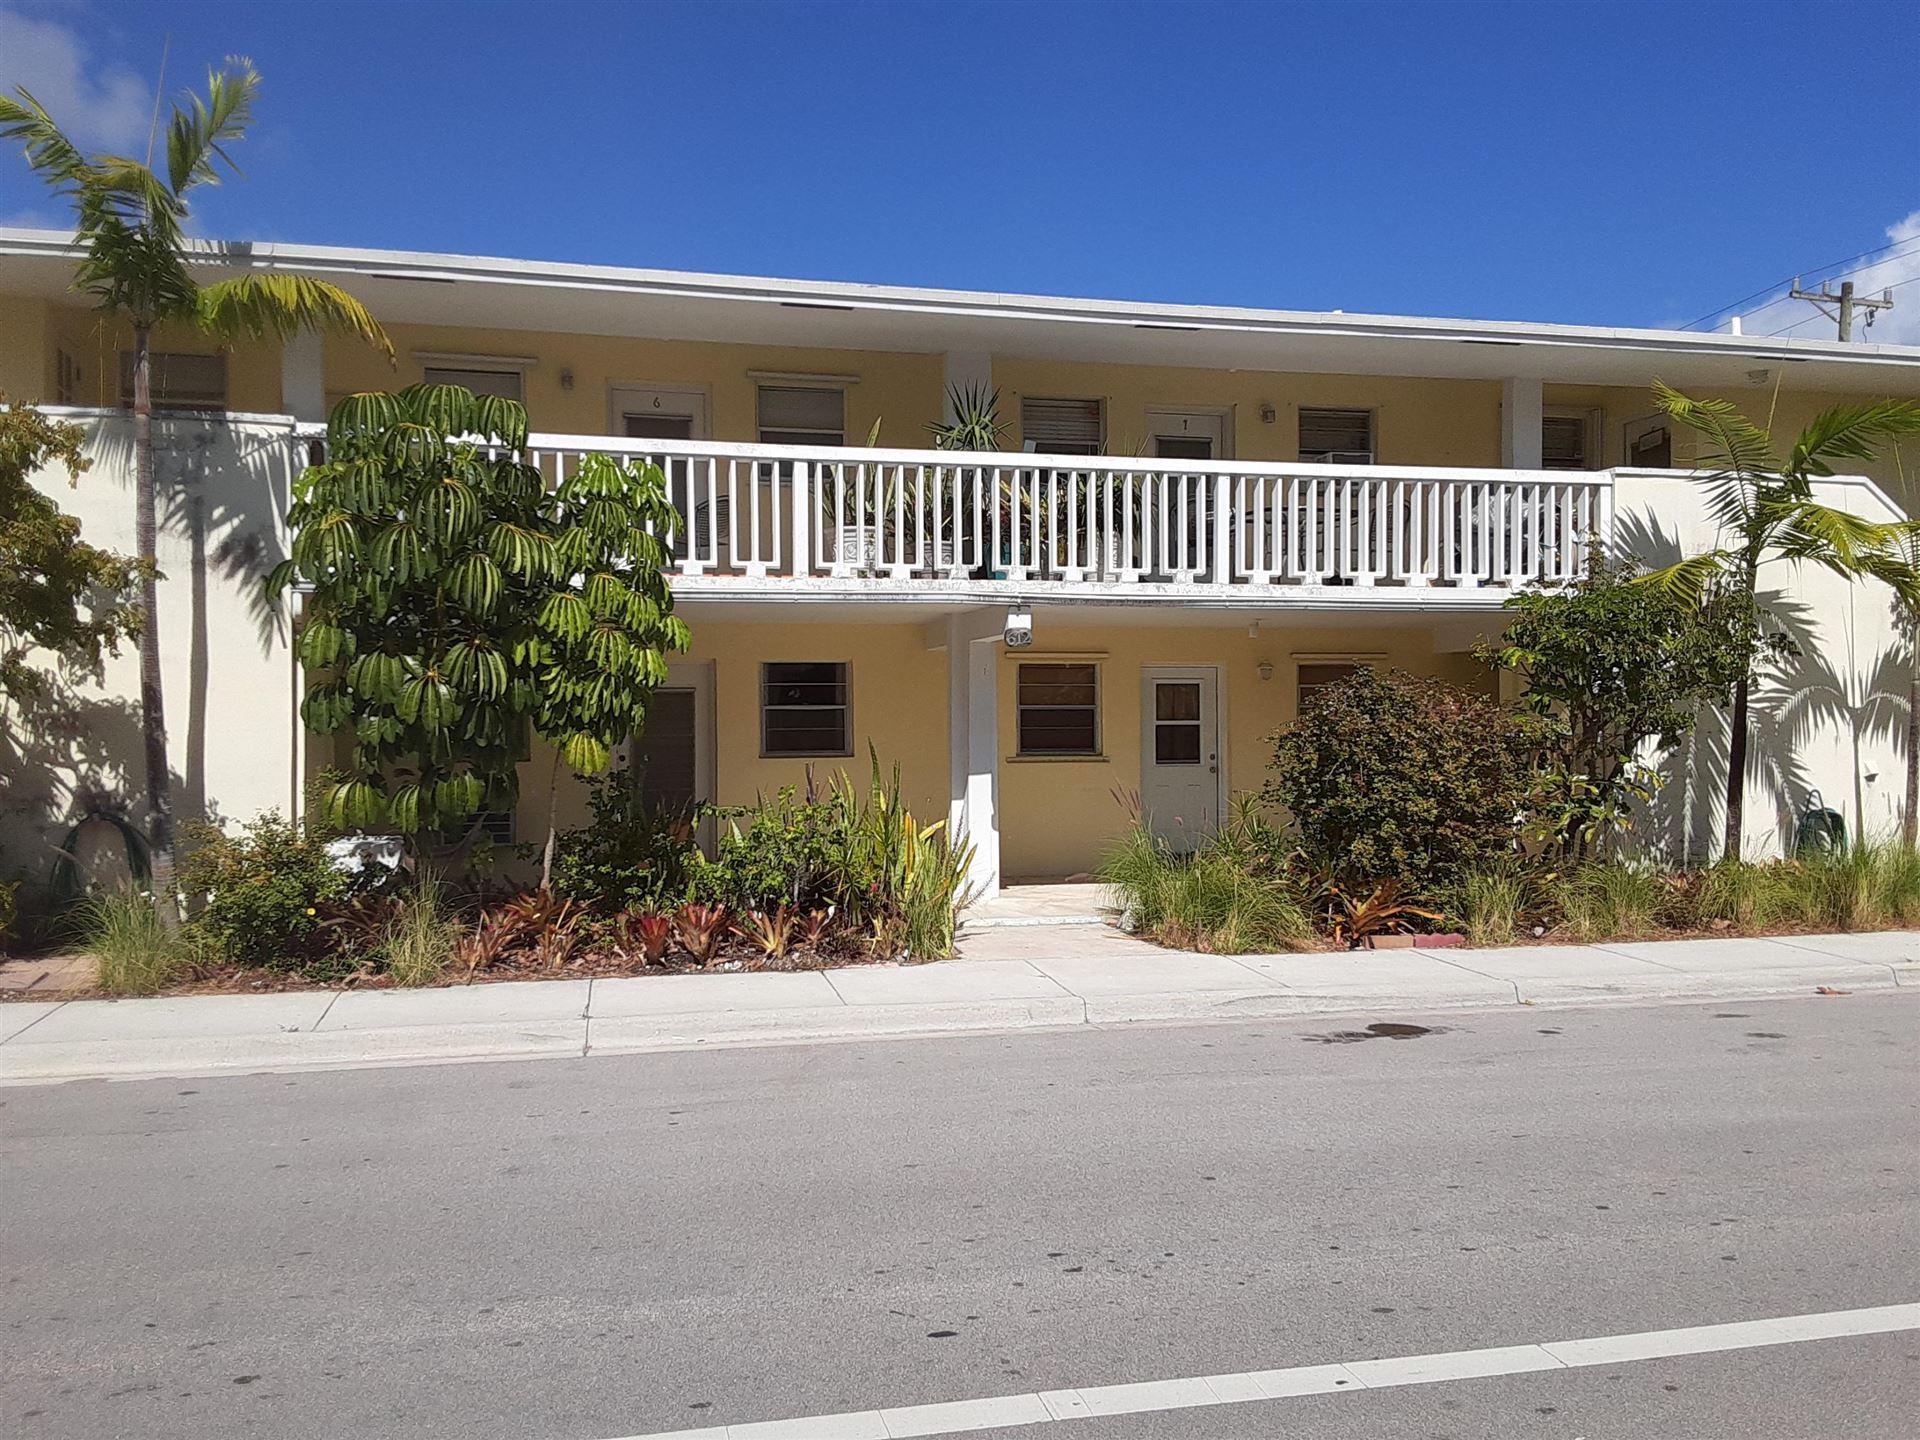 612 2nd Avenue S #3, Lake Worth, FL 33460 - MLS#: RX-10697089